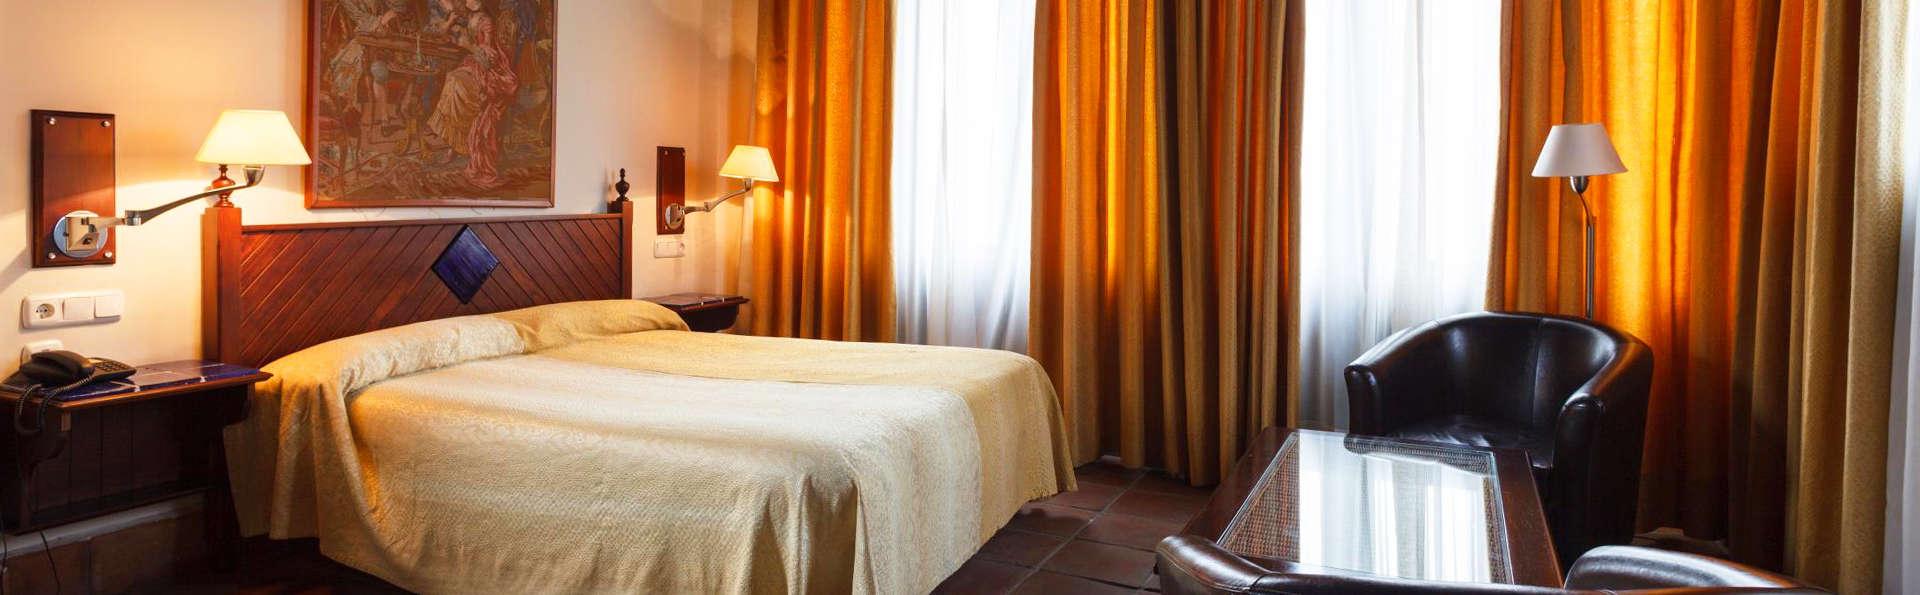 Casa Palacio Pilar del Toro - EDIT_Room6.jpg